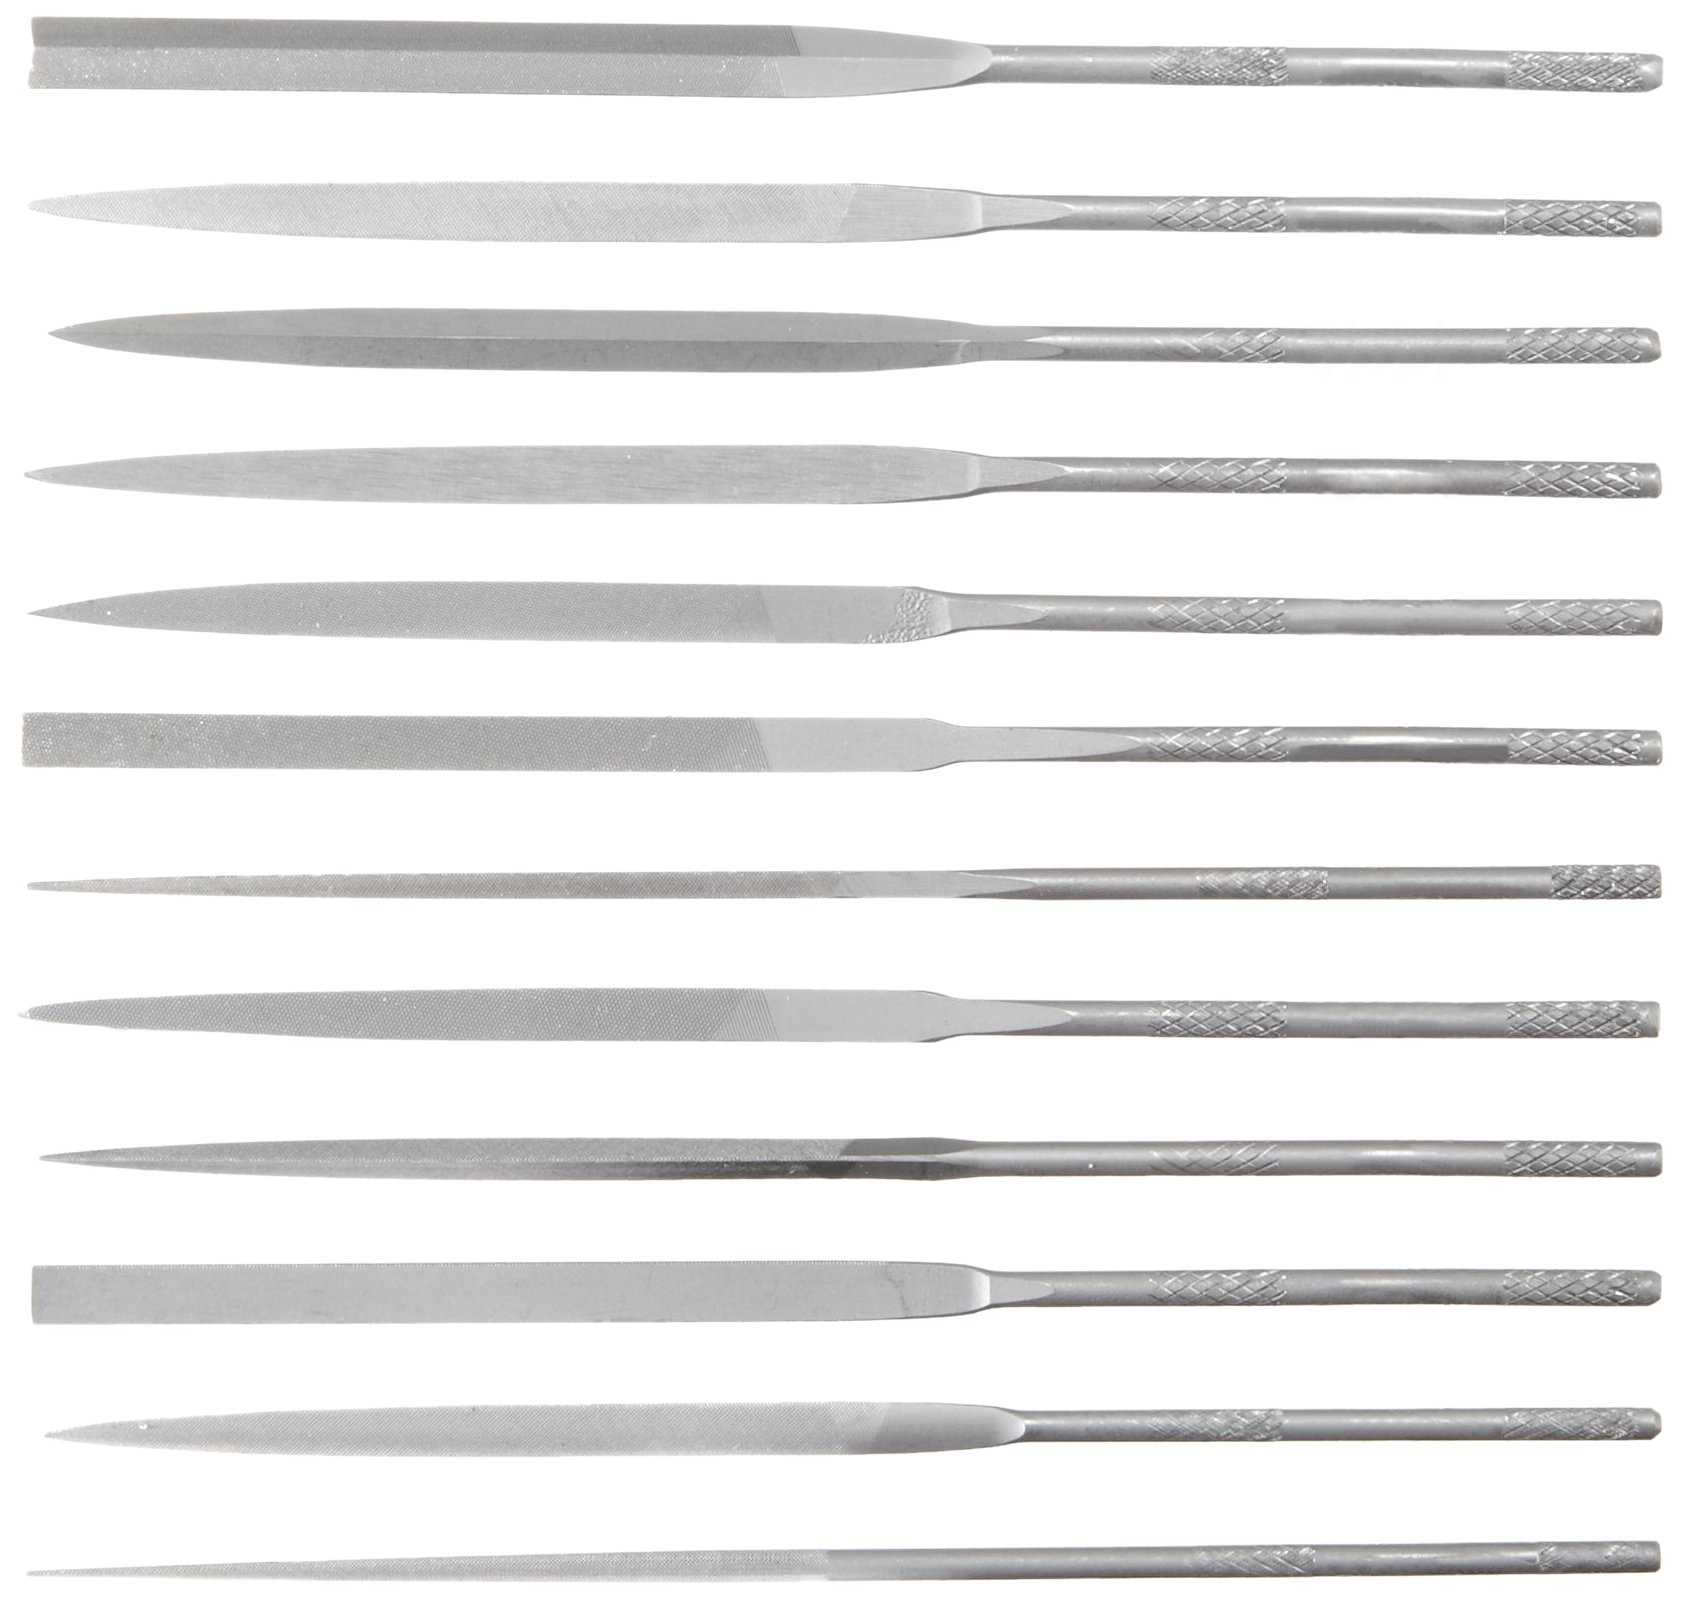 Nicholson 12 Piece Needle File Set with Handles, Swiss Pattern, Double Cut, #2 Coarseness, 4'' Length